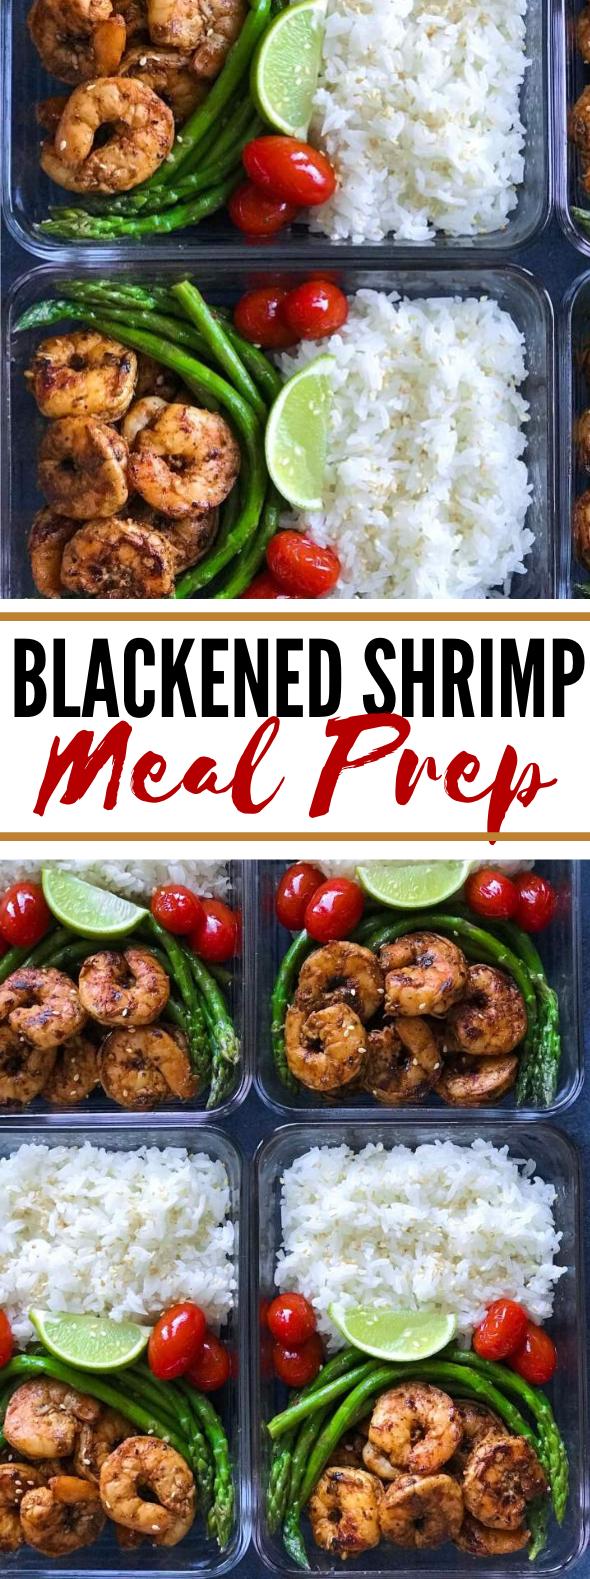 BLACKENED SHRIMP MEAL PREP #lunch #healthy